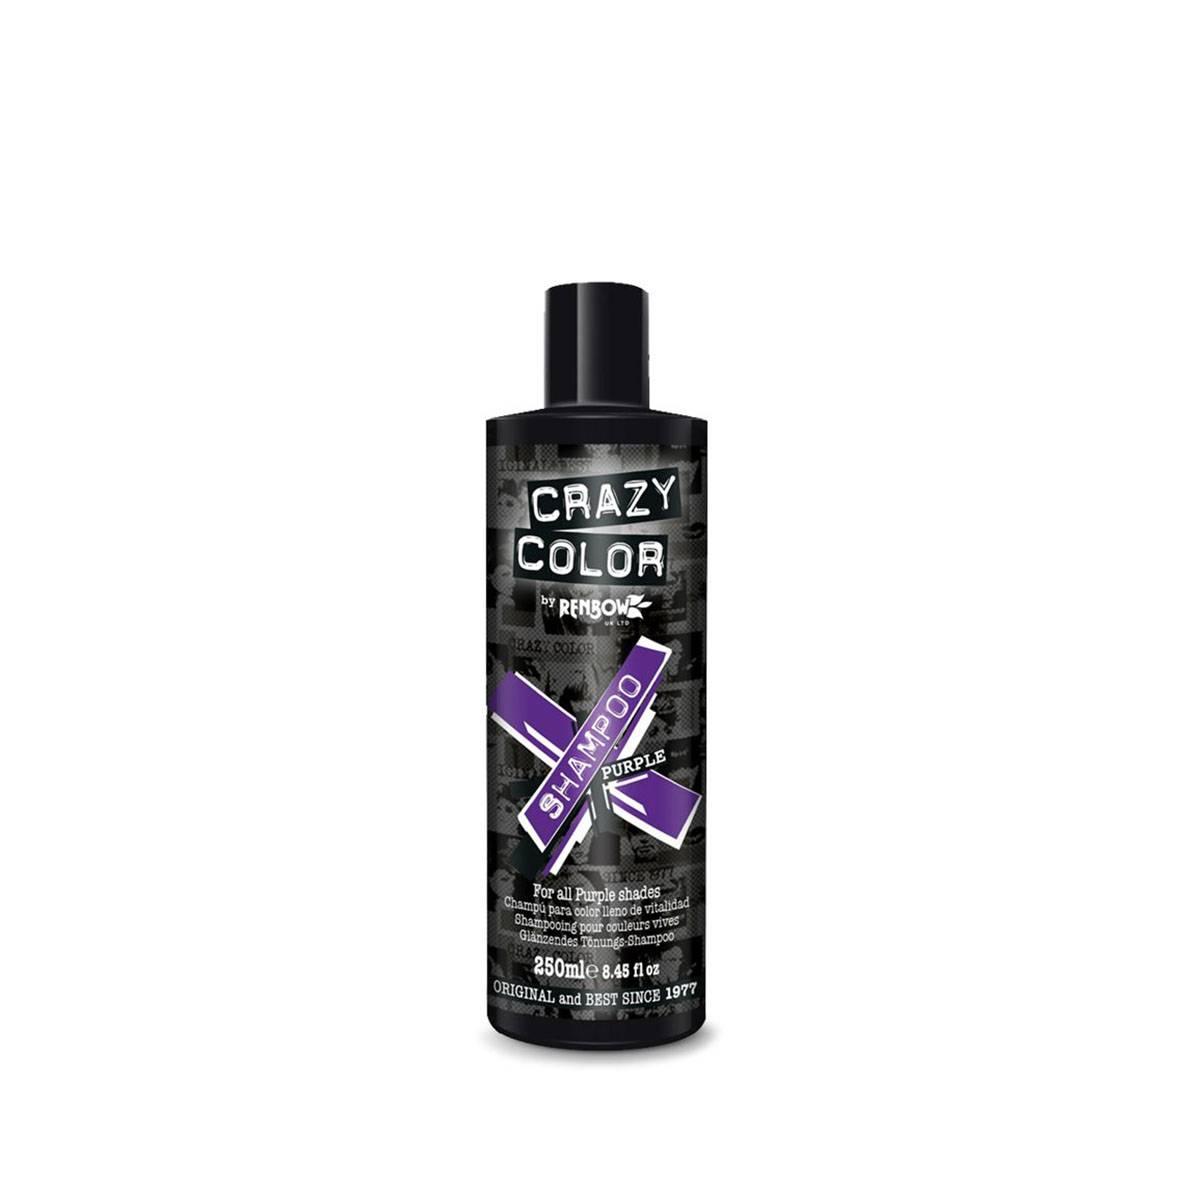 Crazy Color Shampoo 250ml Purp Le**